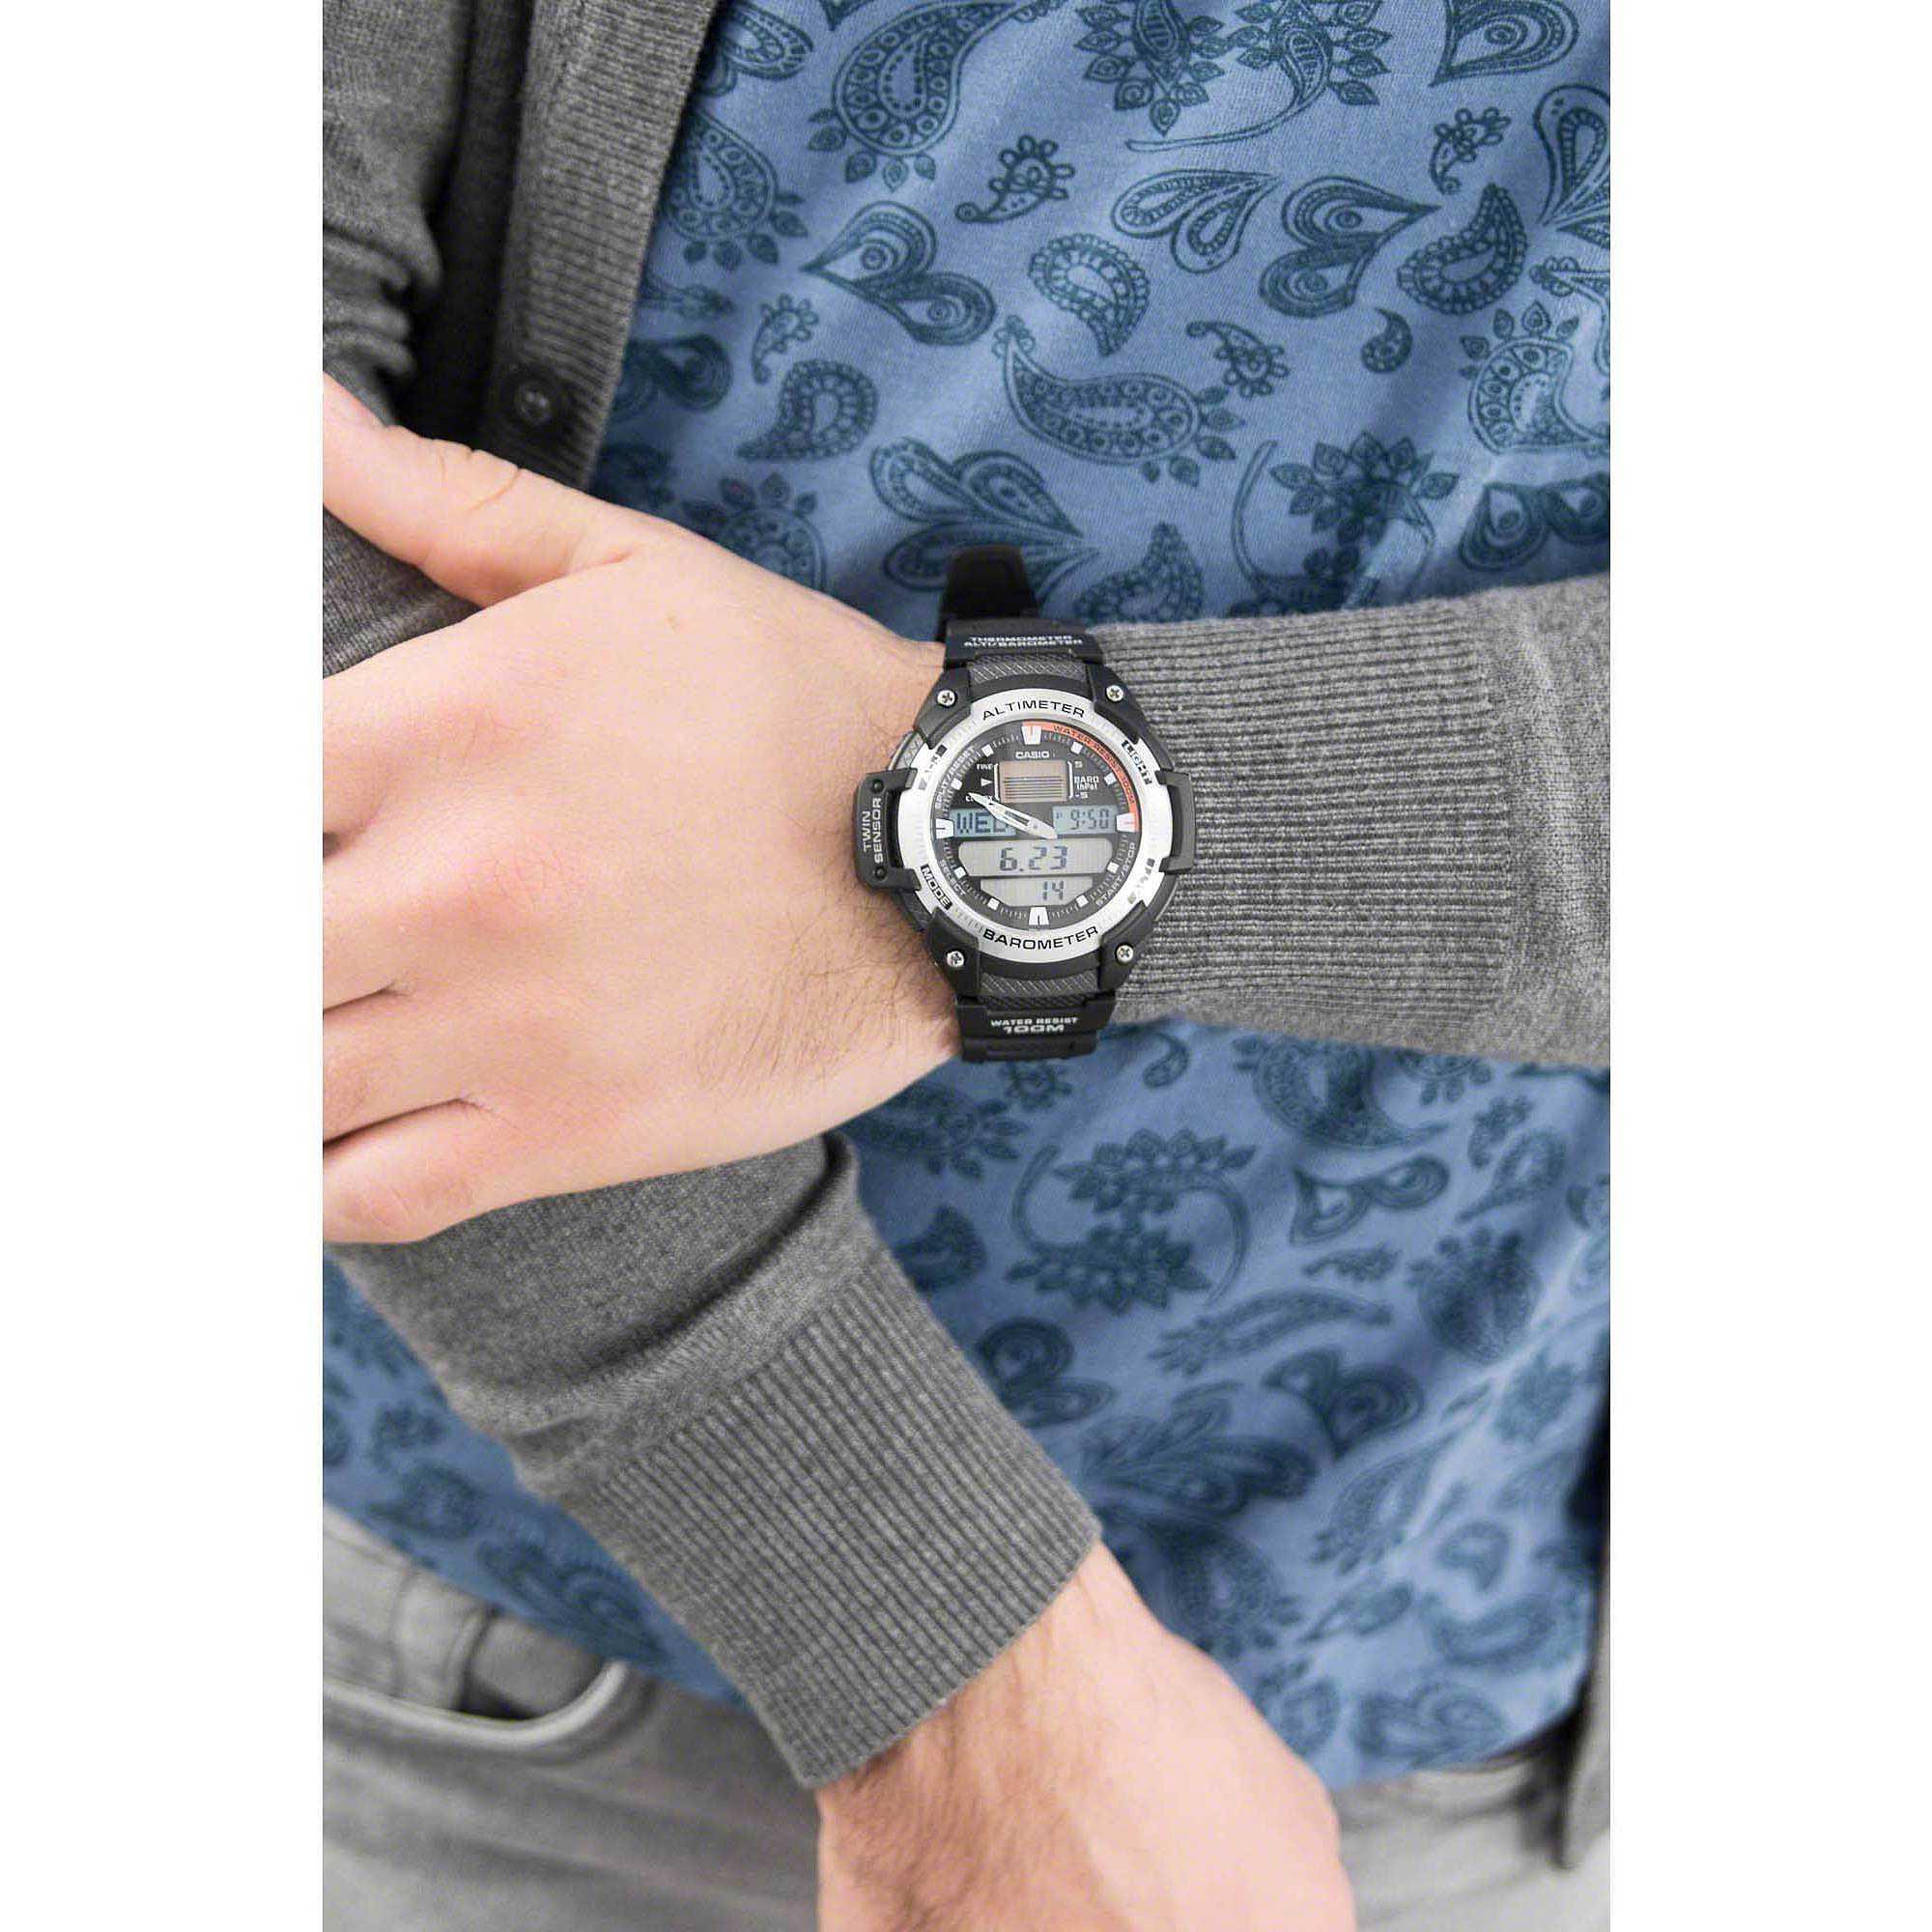 watch digital man Casio CASIO COLLECTION SGW-400H-1BVER digitals Casio 0bf0419fa80